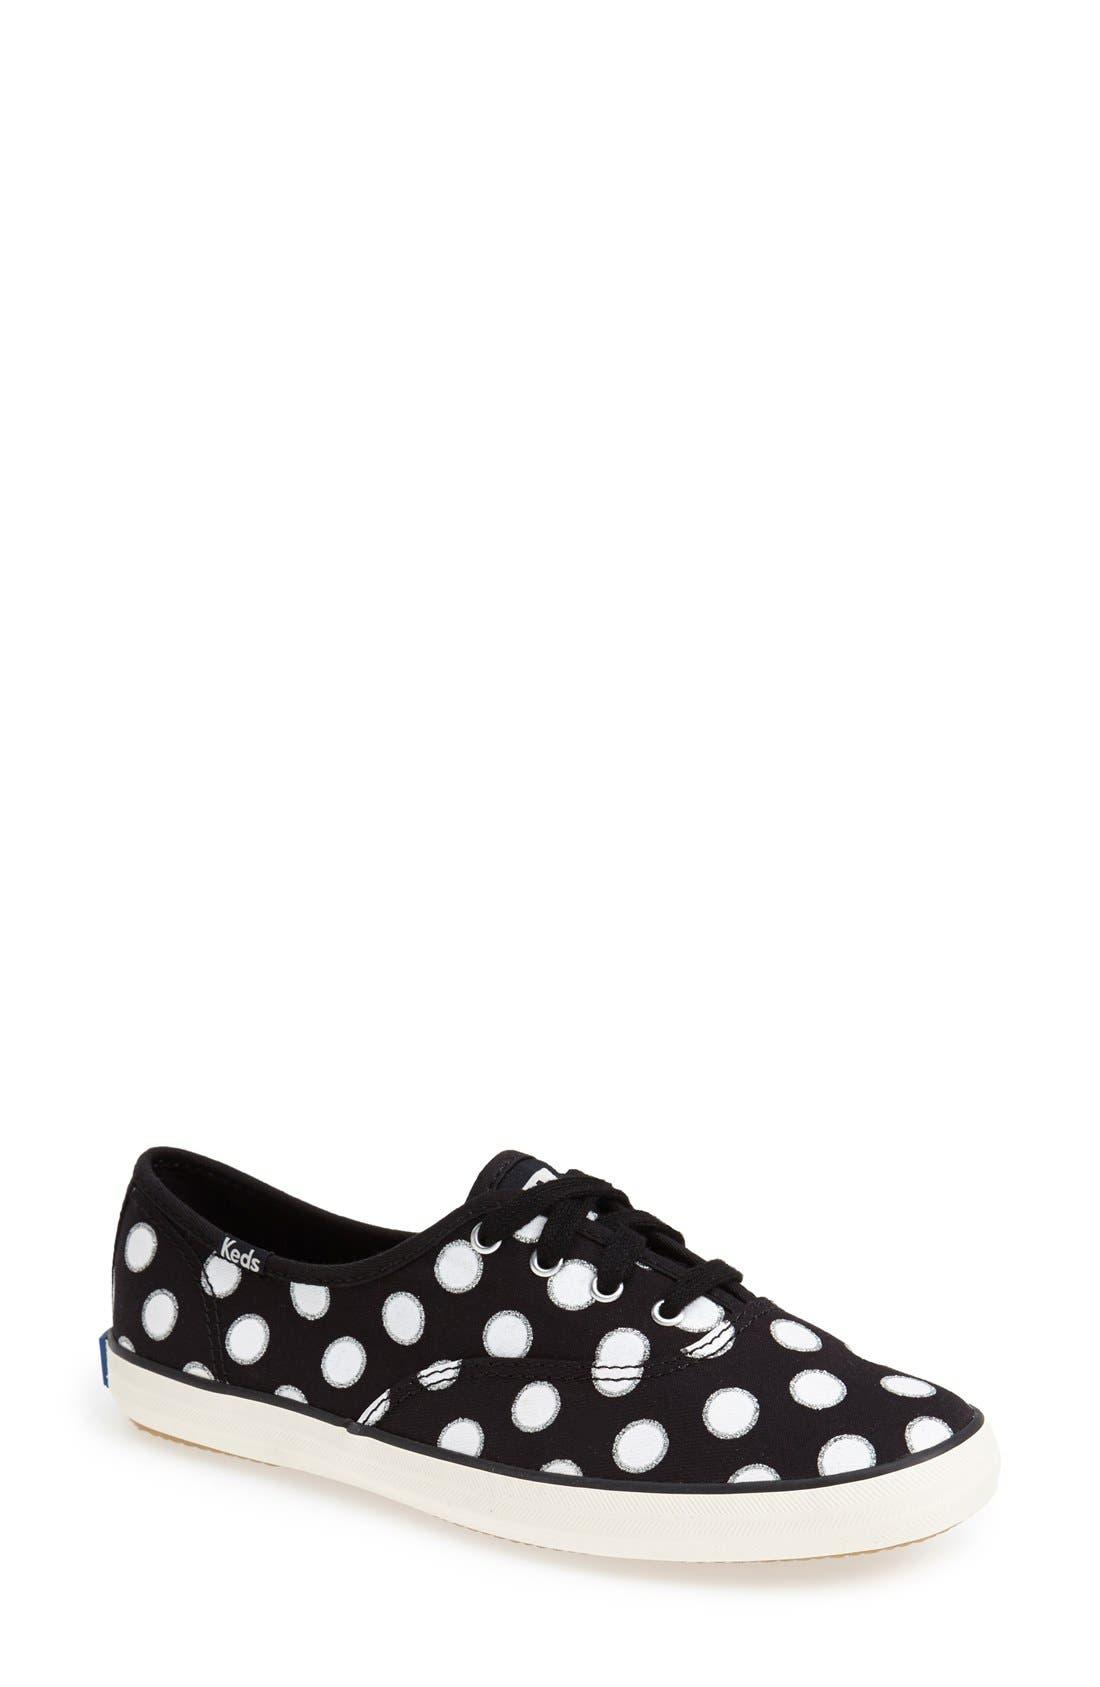 Main Image - Keds® 'Champion - Glitter Dot' Canvas Sneaker (Women) (Regular Retail Price: $49.95)